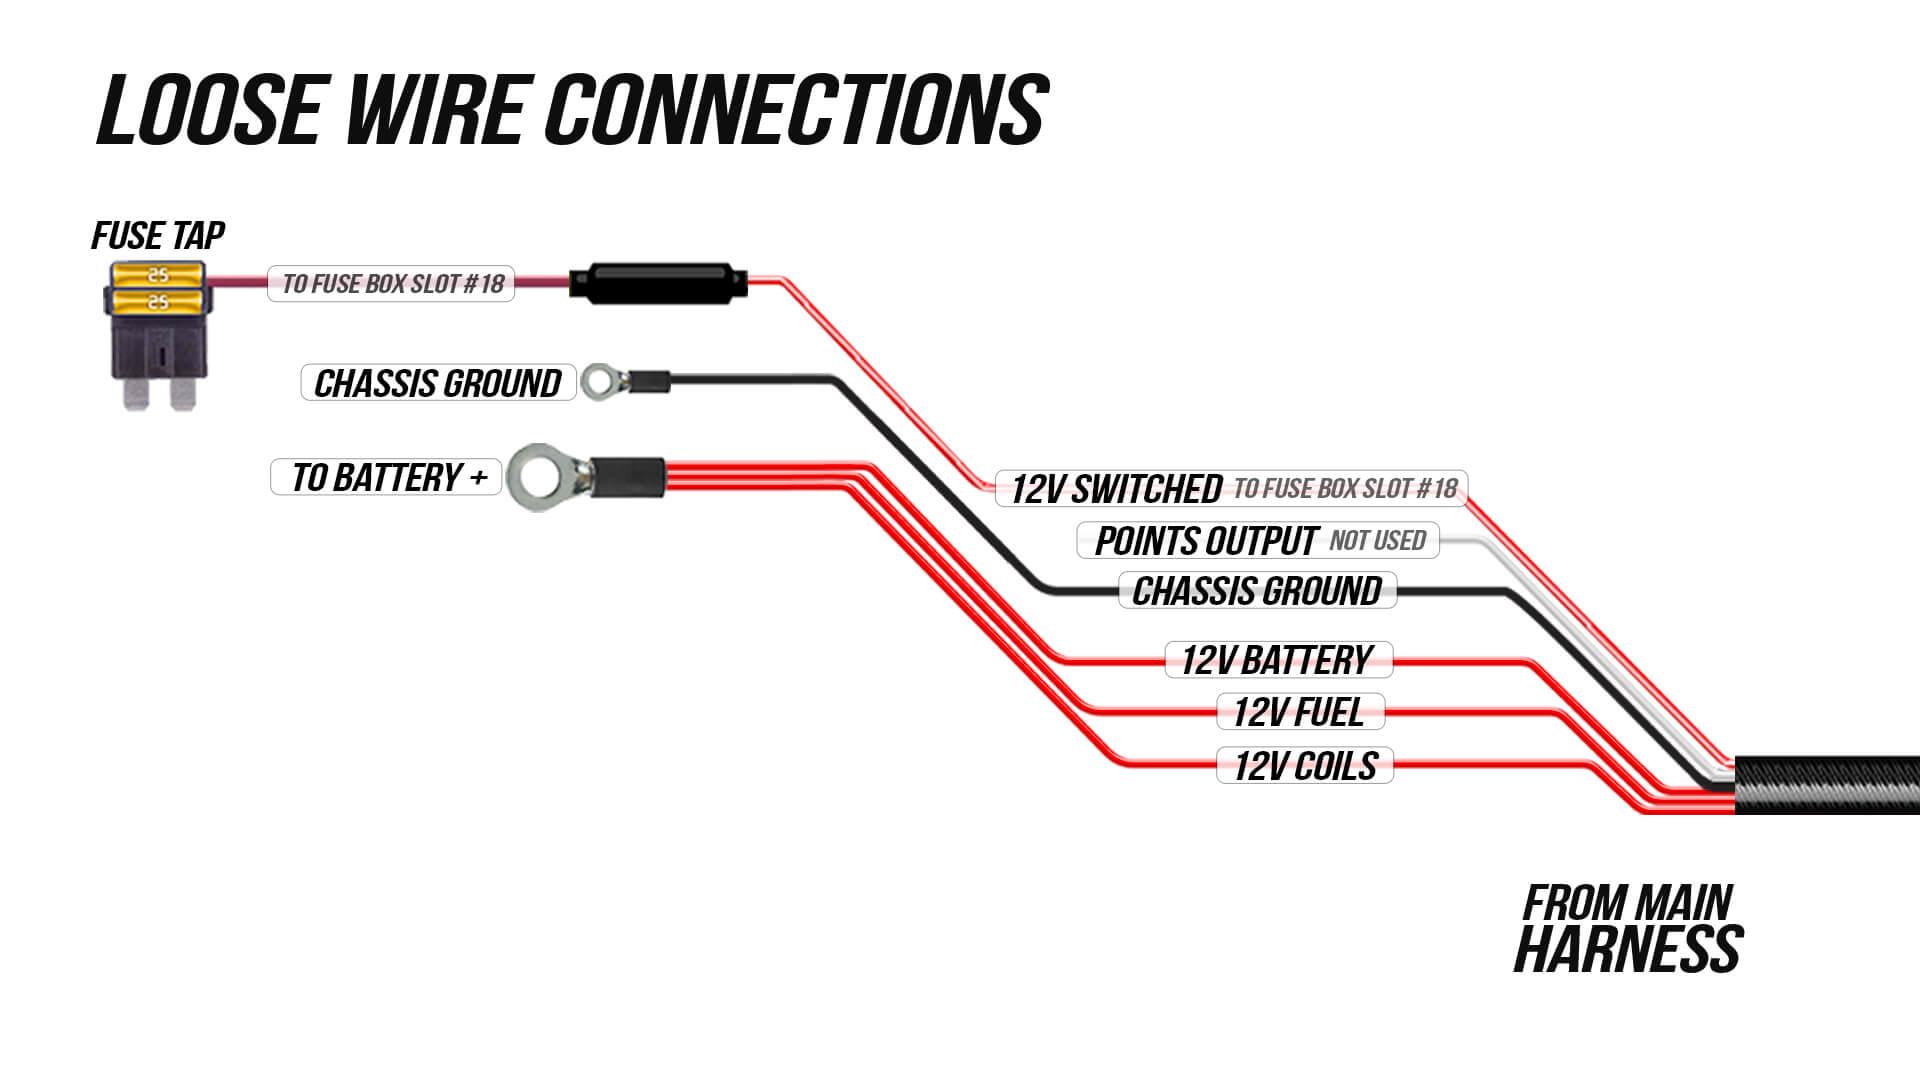 Wiring Diagram Loose Wires